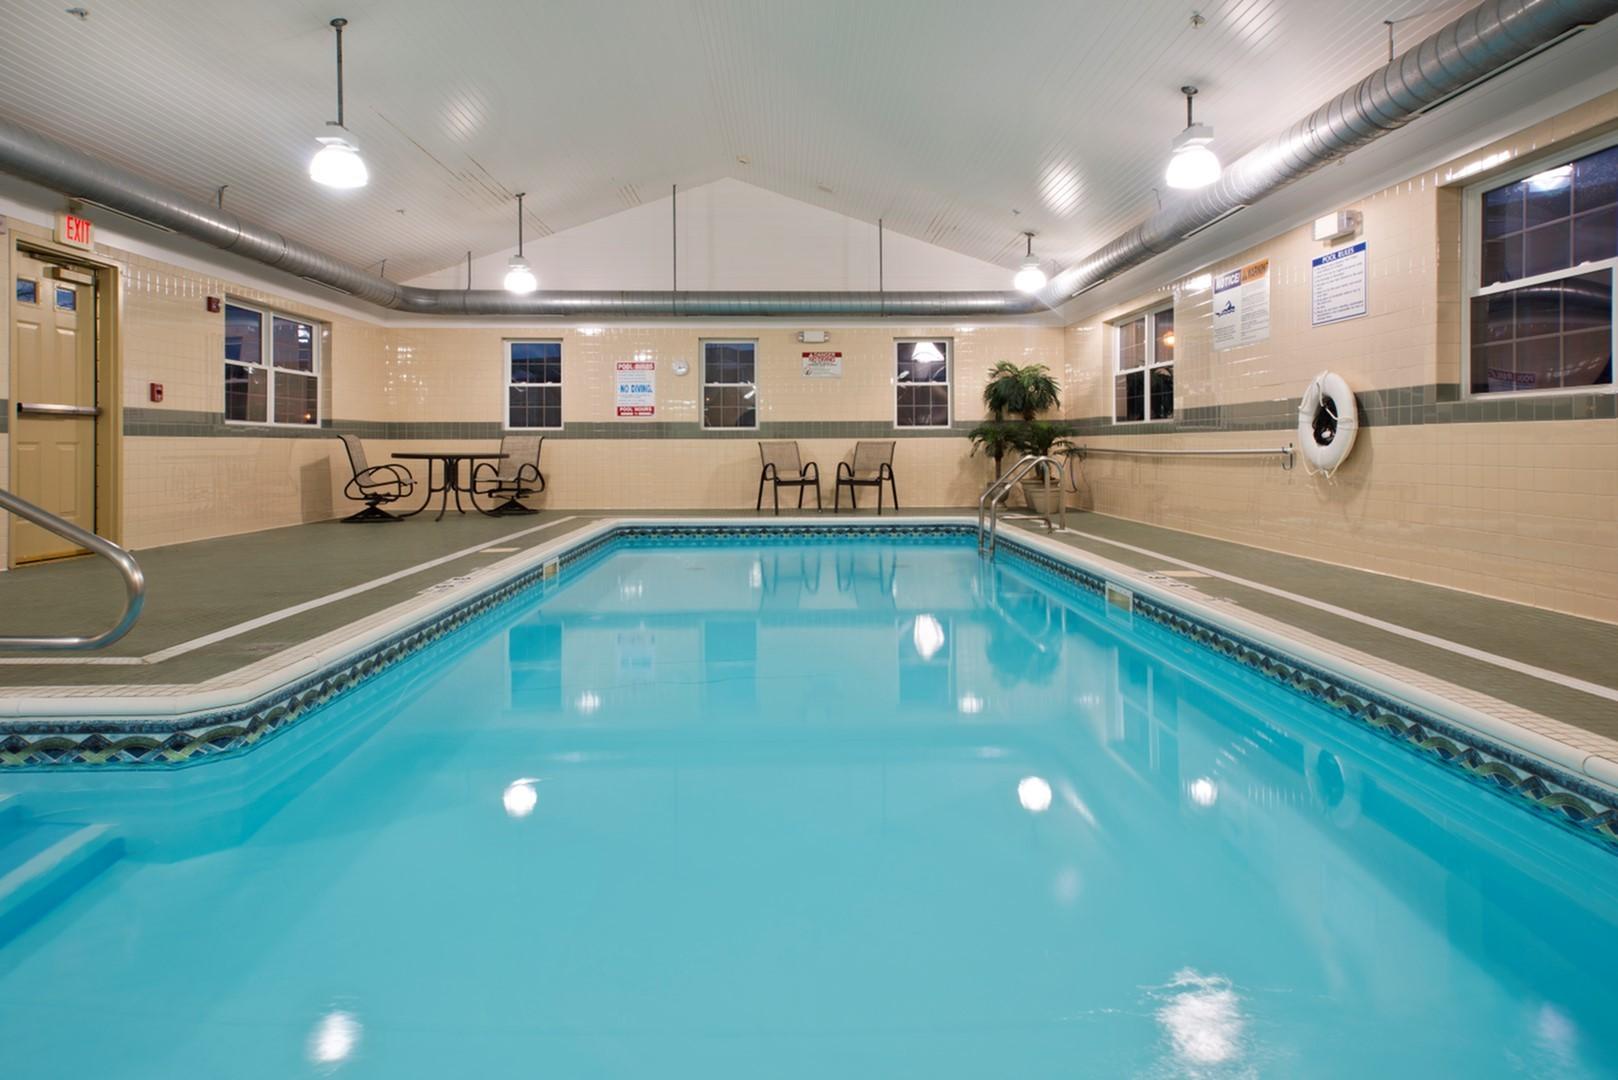 Hearthstone Village indoor pool